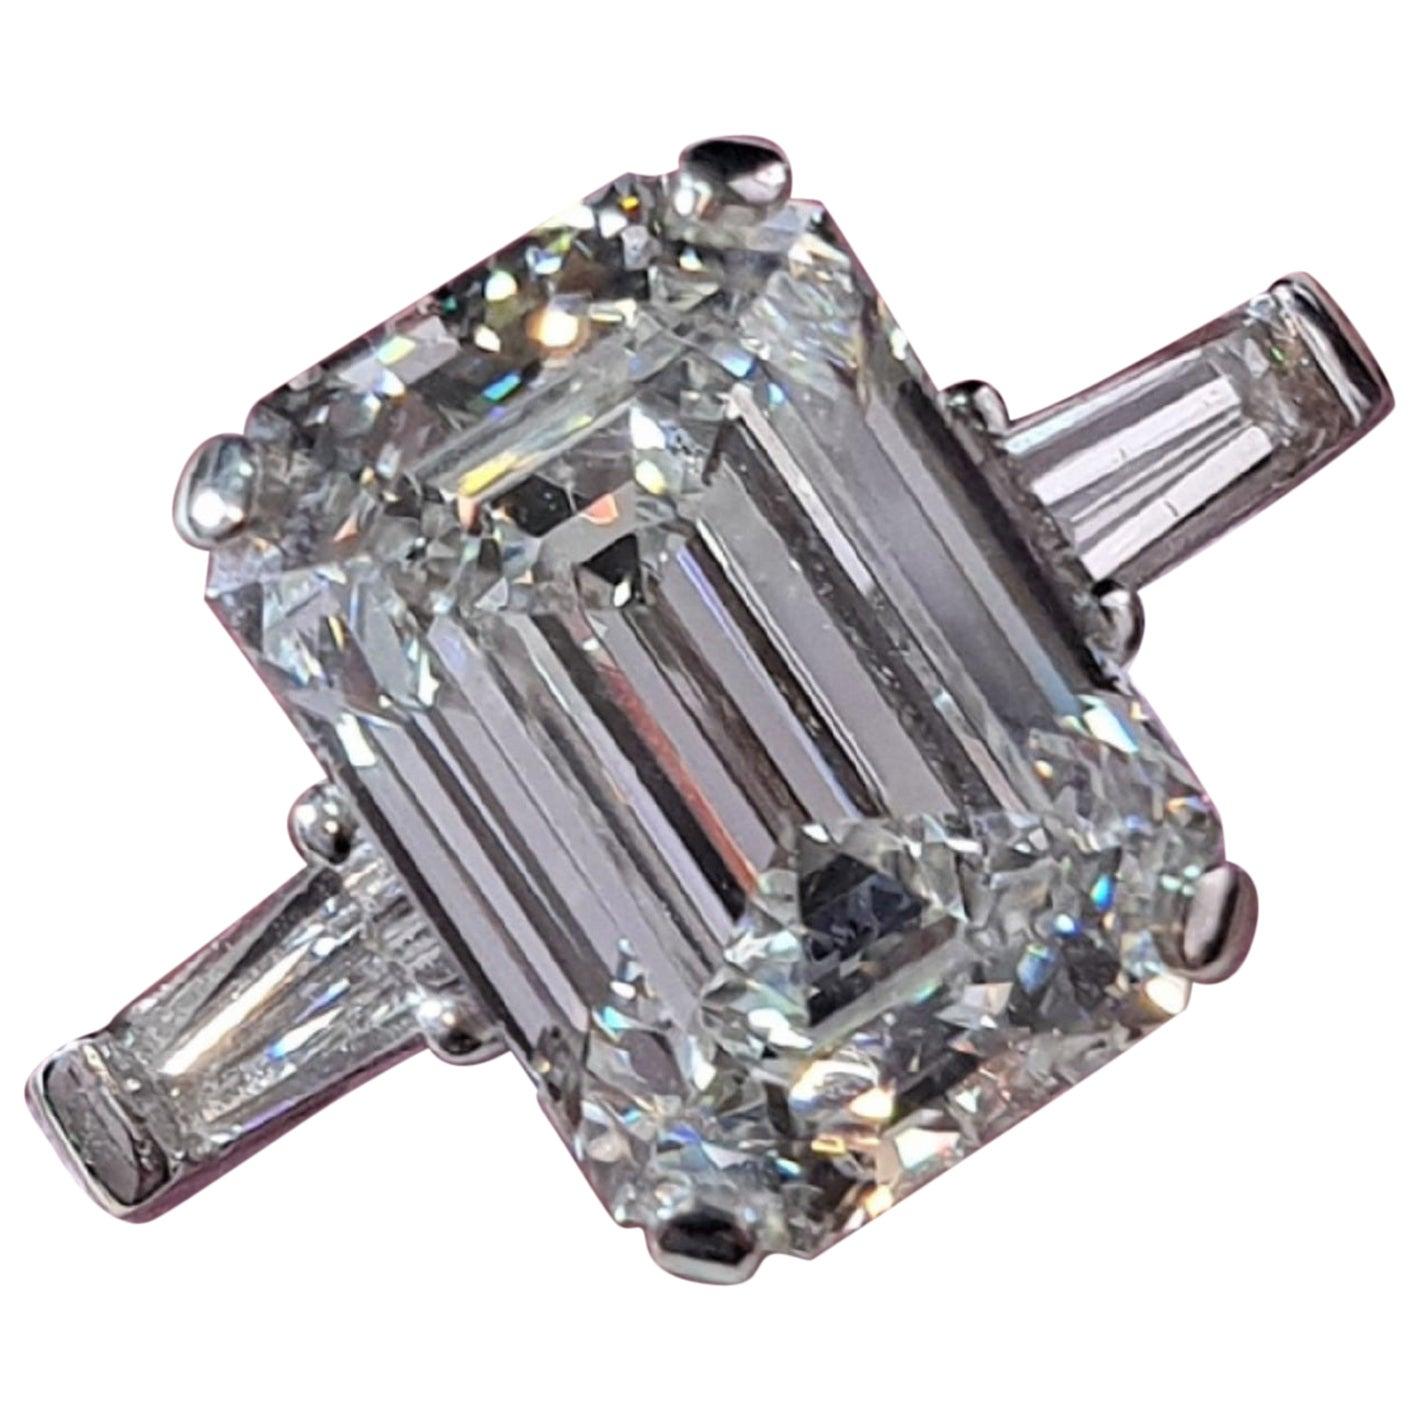 Internally Flawless D Color GIA Certified 2.70 Carat Emerald Cut Diamond